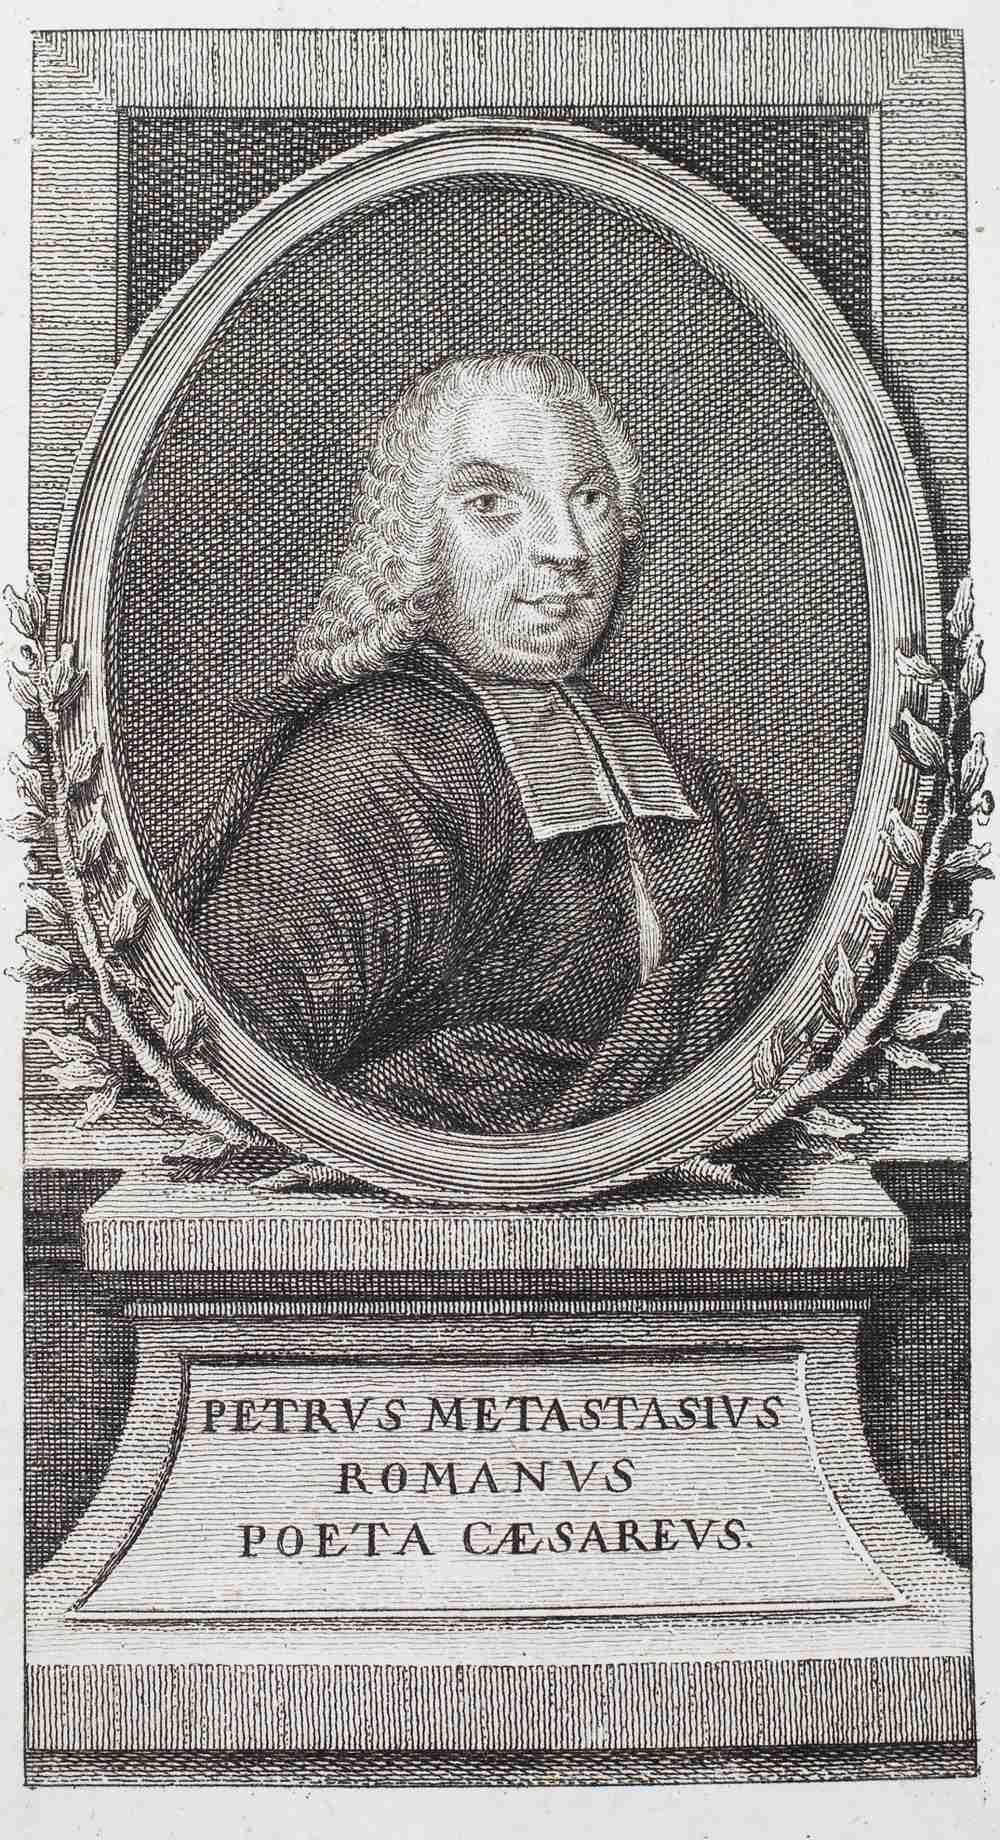 METASTASIO, Pietro (1698-1782), Italian Poet 'Opere Drammatiche, Oratori Sacri e Poesie Diverse'. - Image 2 of 3